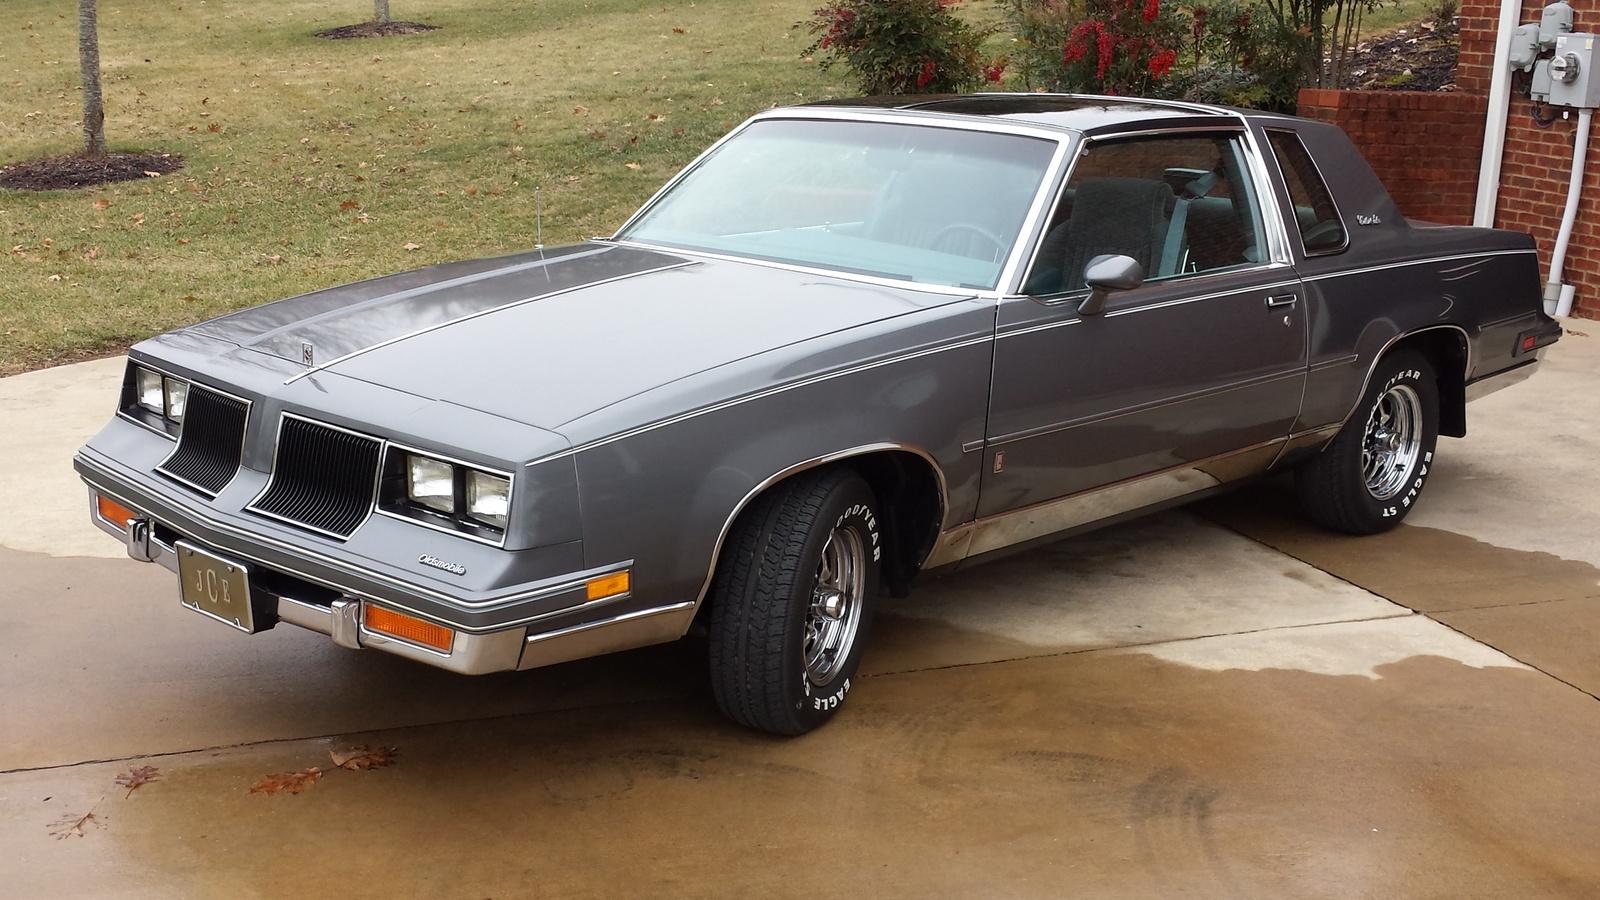 Cargurus Cars For Sale >> 1986 Oldsmobile Cutlass Supreme - Overview - CarGurus